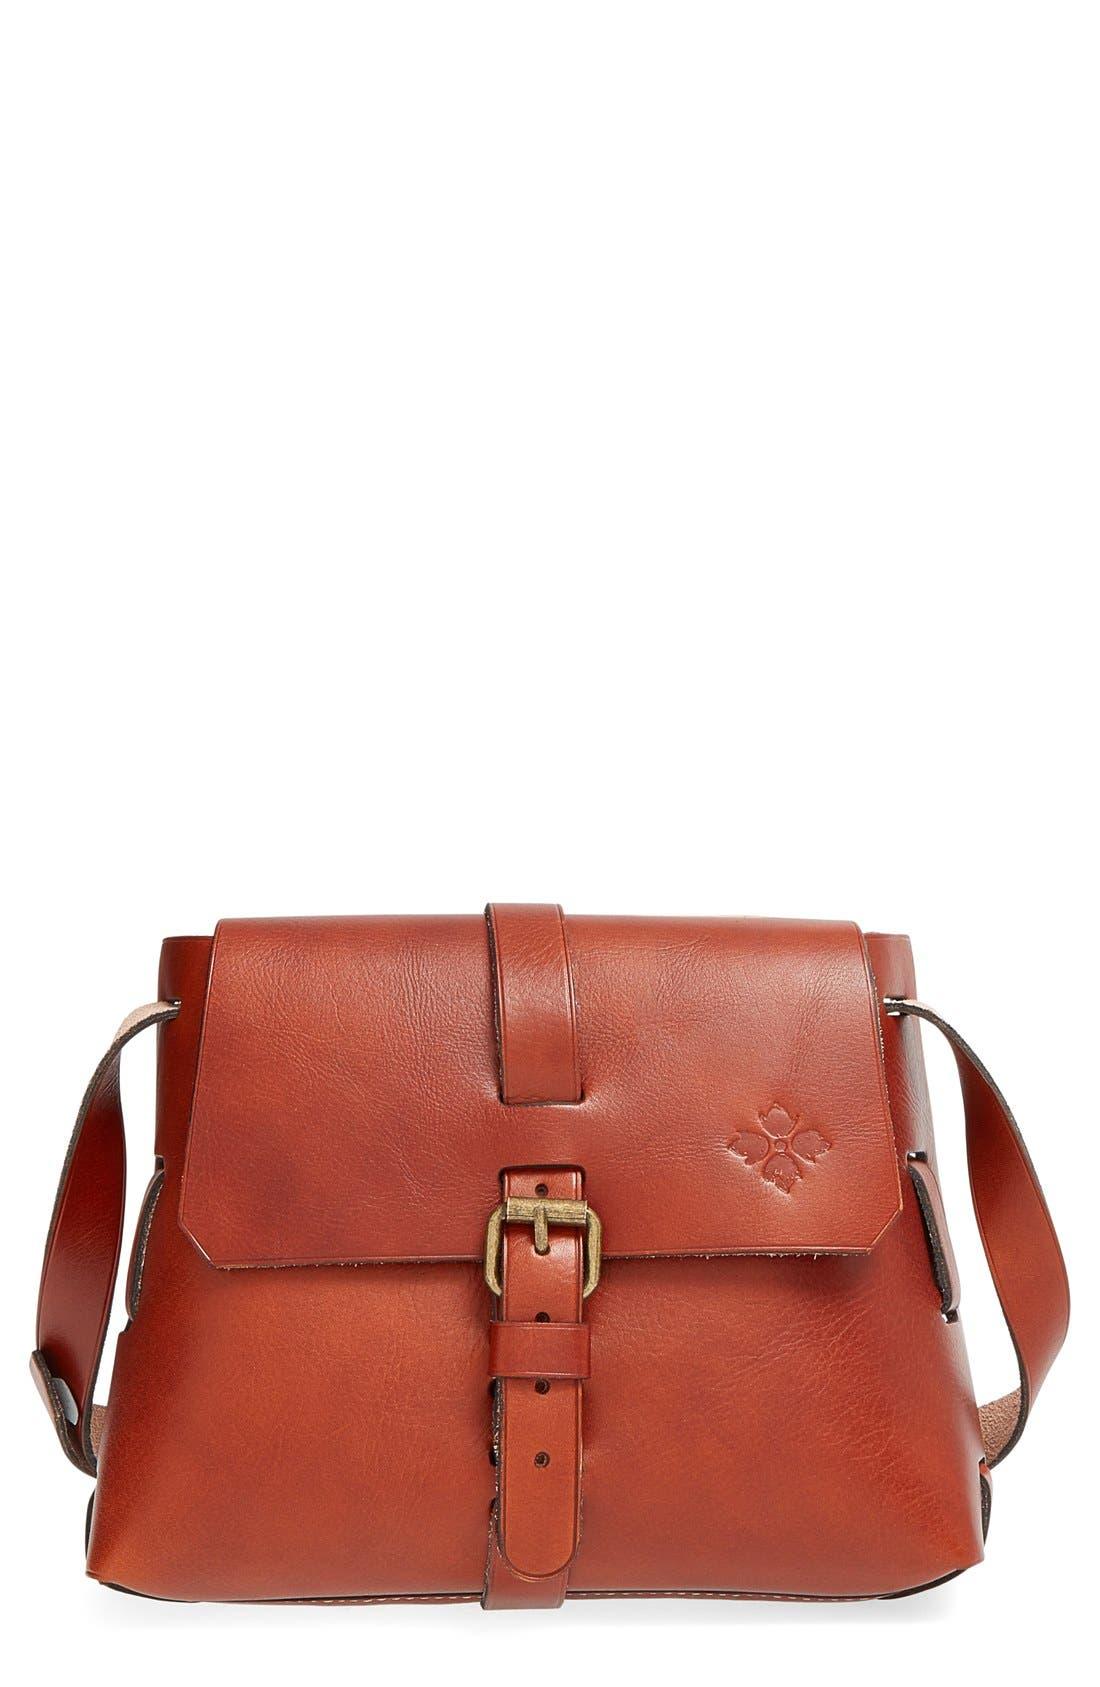 Main Image - Patricia Nash 'Frattini' Crossbody Bag